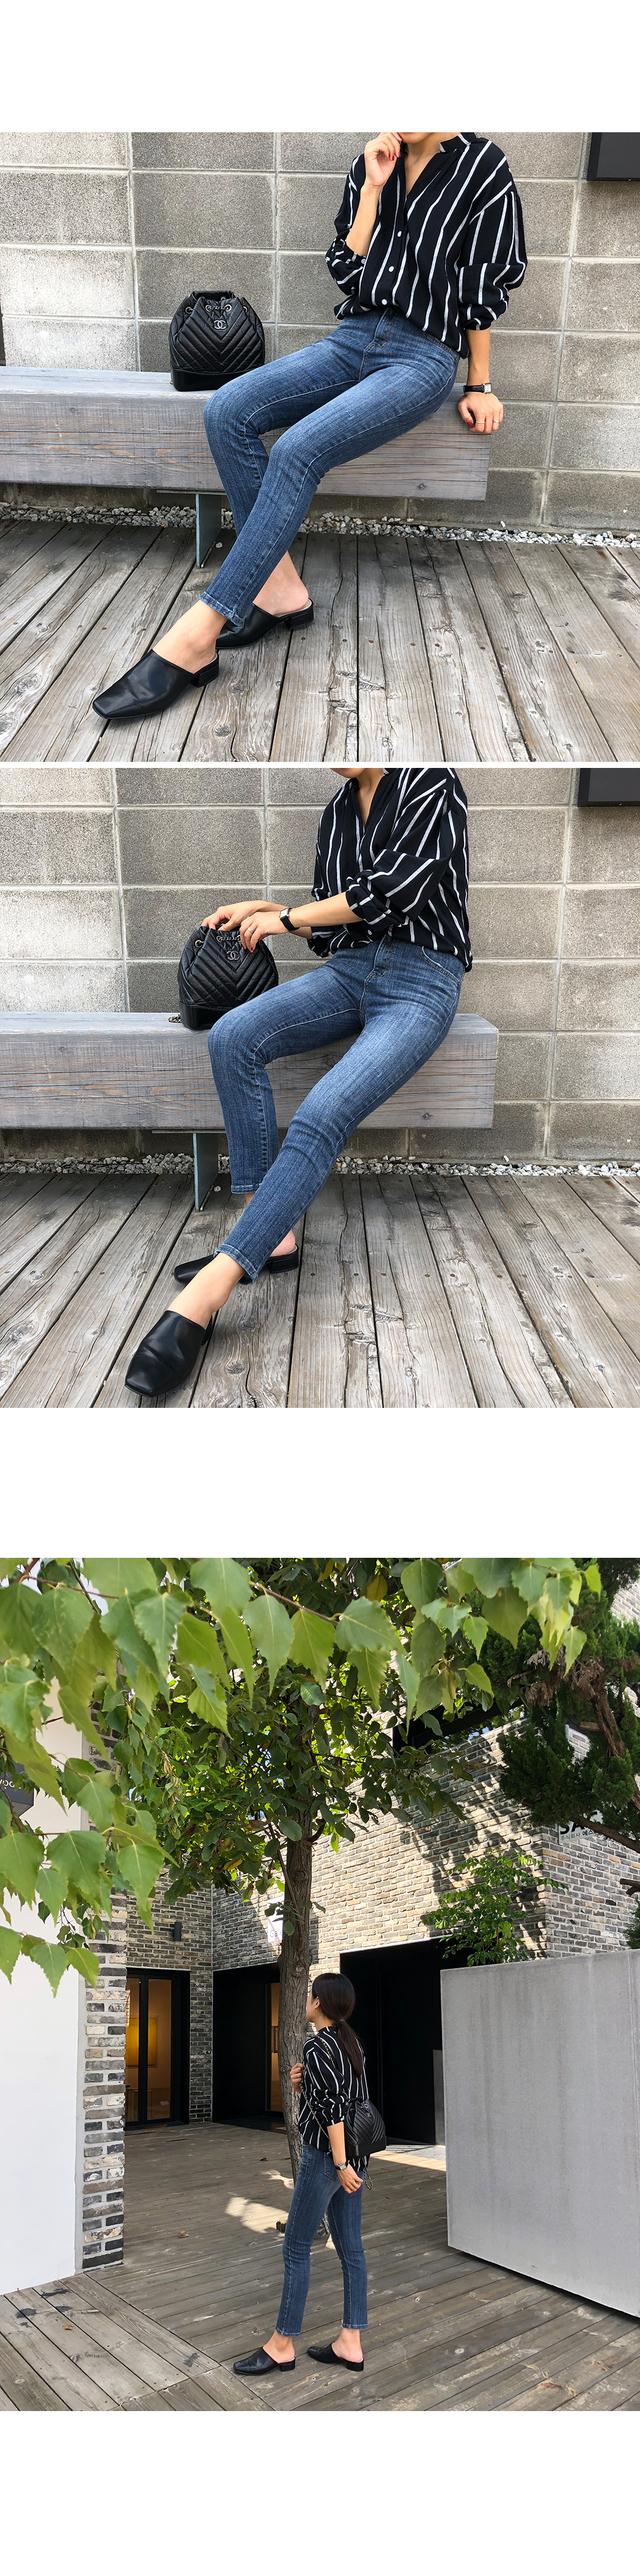 Mauer-Bending Date Skinny